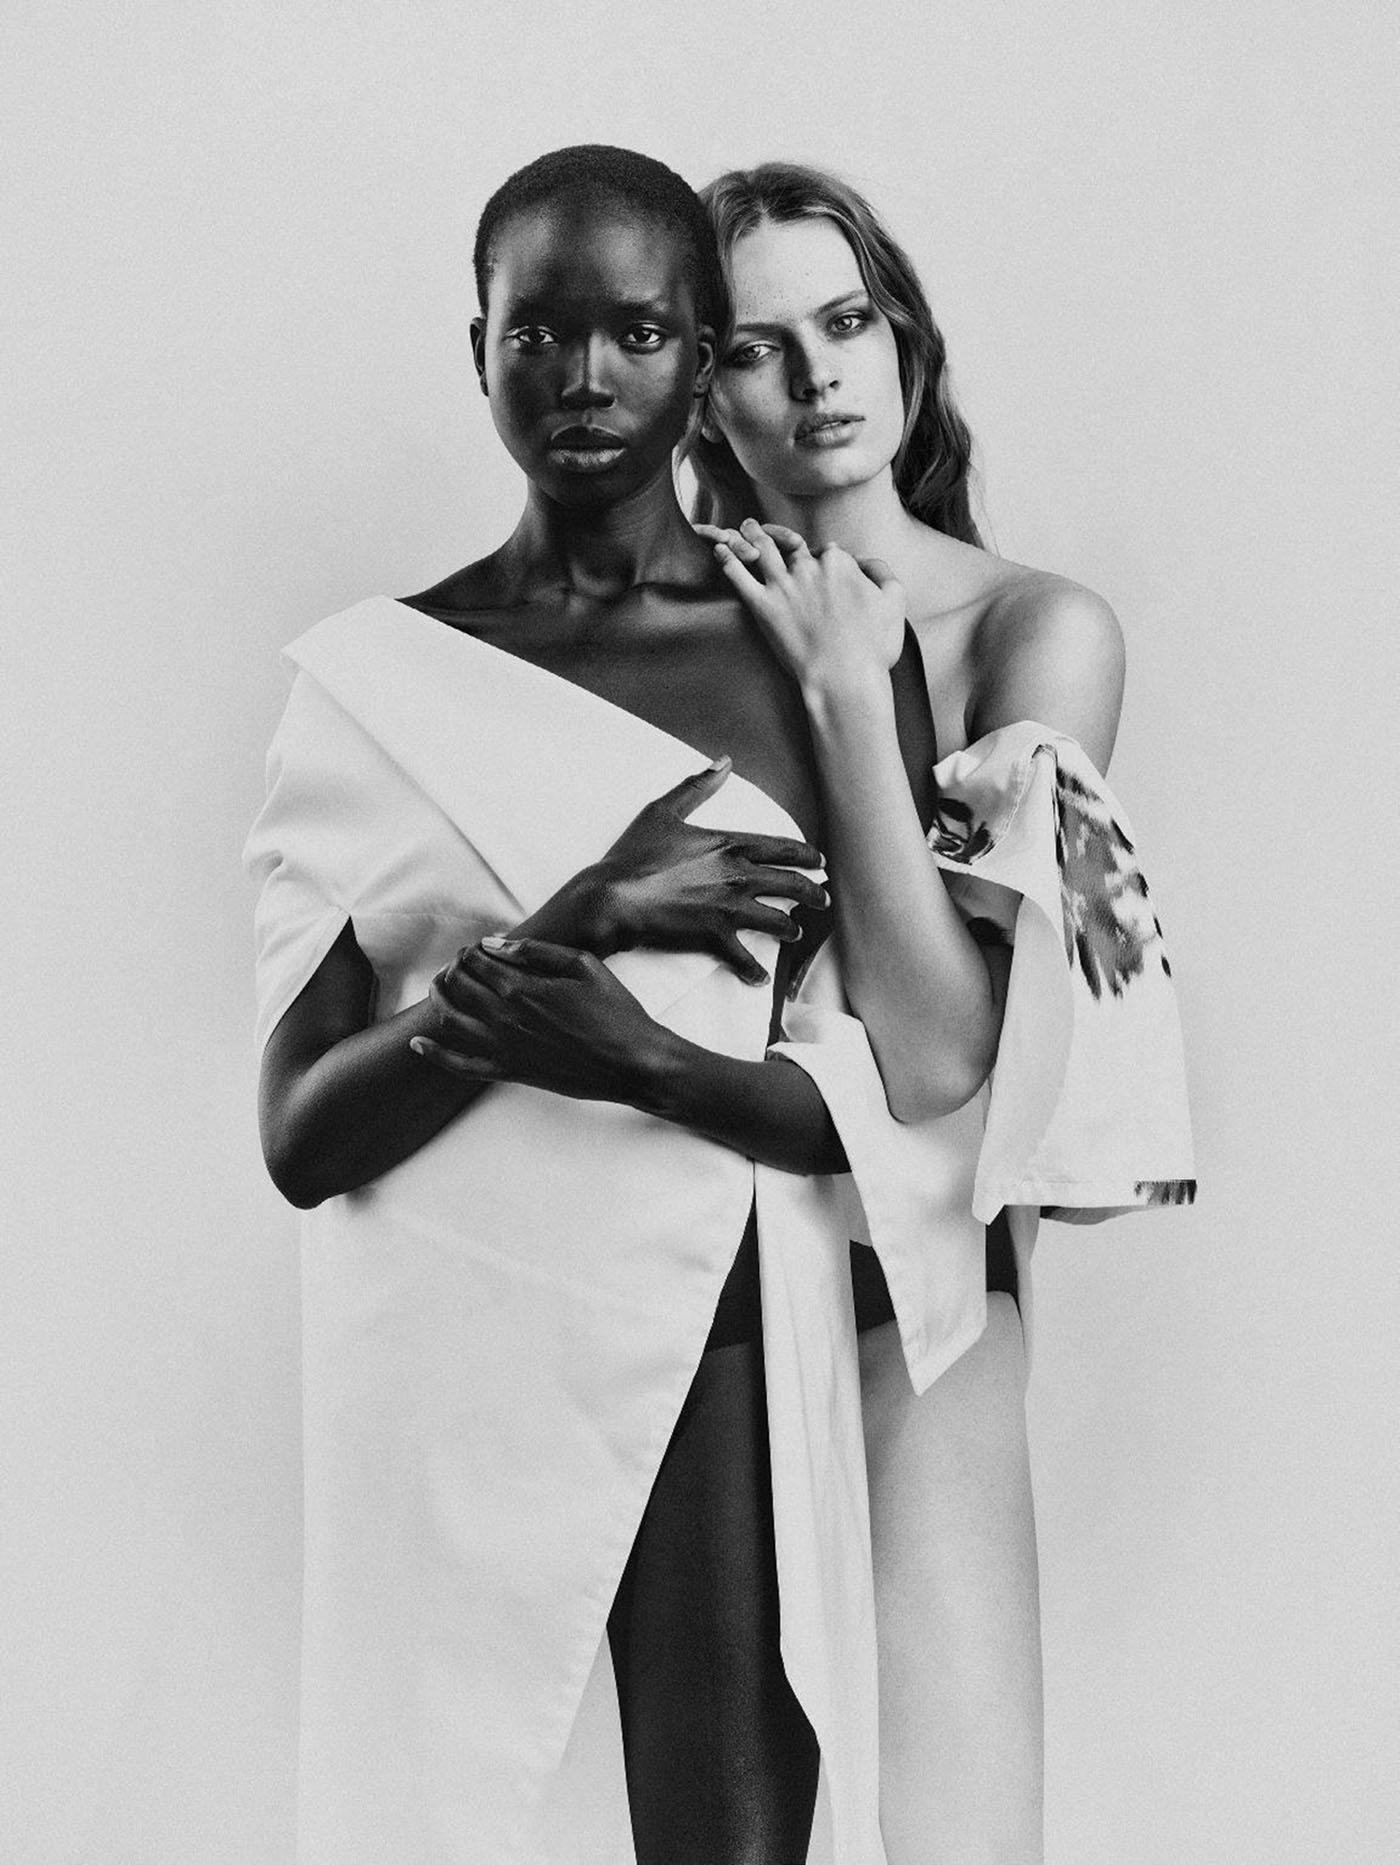 Ajok Madel and Sophia Roetz by Bastiaan Woudt for Numéro June/July/August 2021